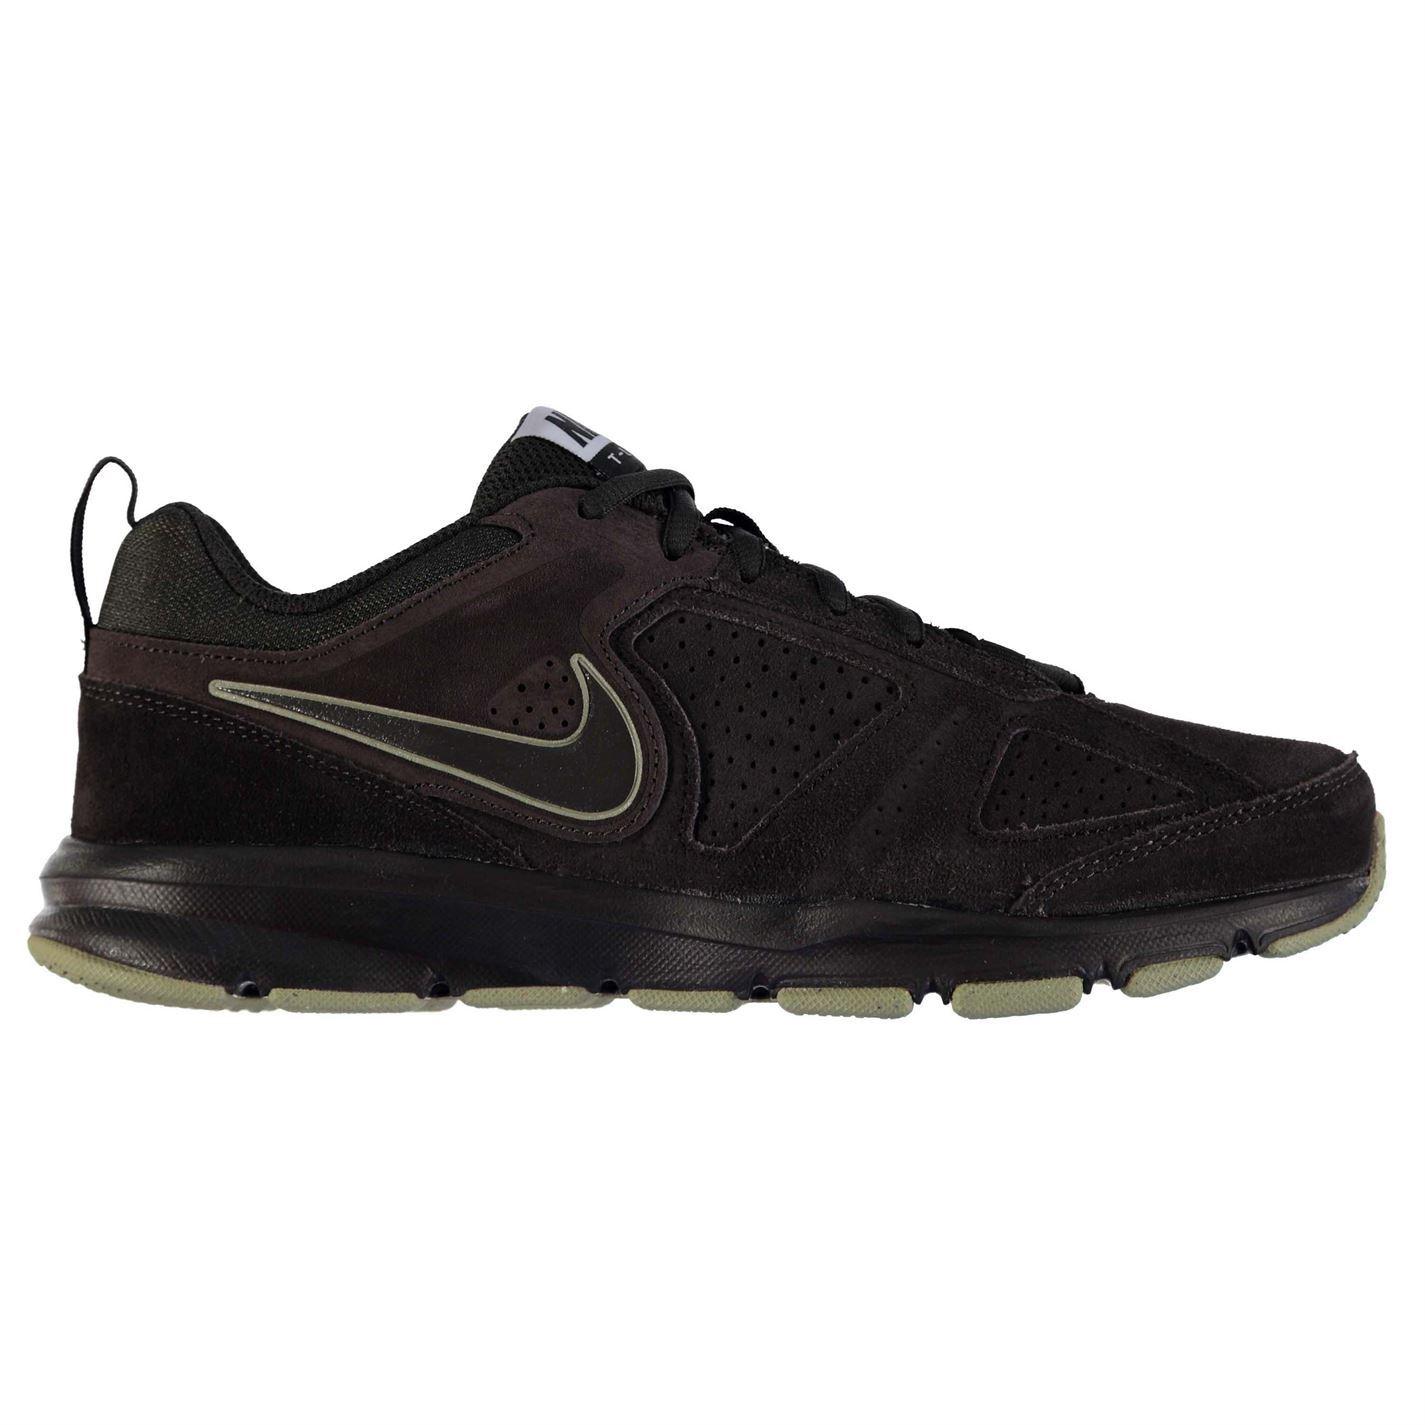 save off d146e a9890 Nike Scarpe Uomo Scarpe da corsa Scarpe da ginnastica trainers T Lite 11  Nubuck